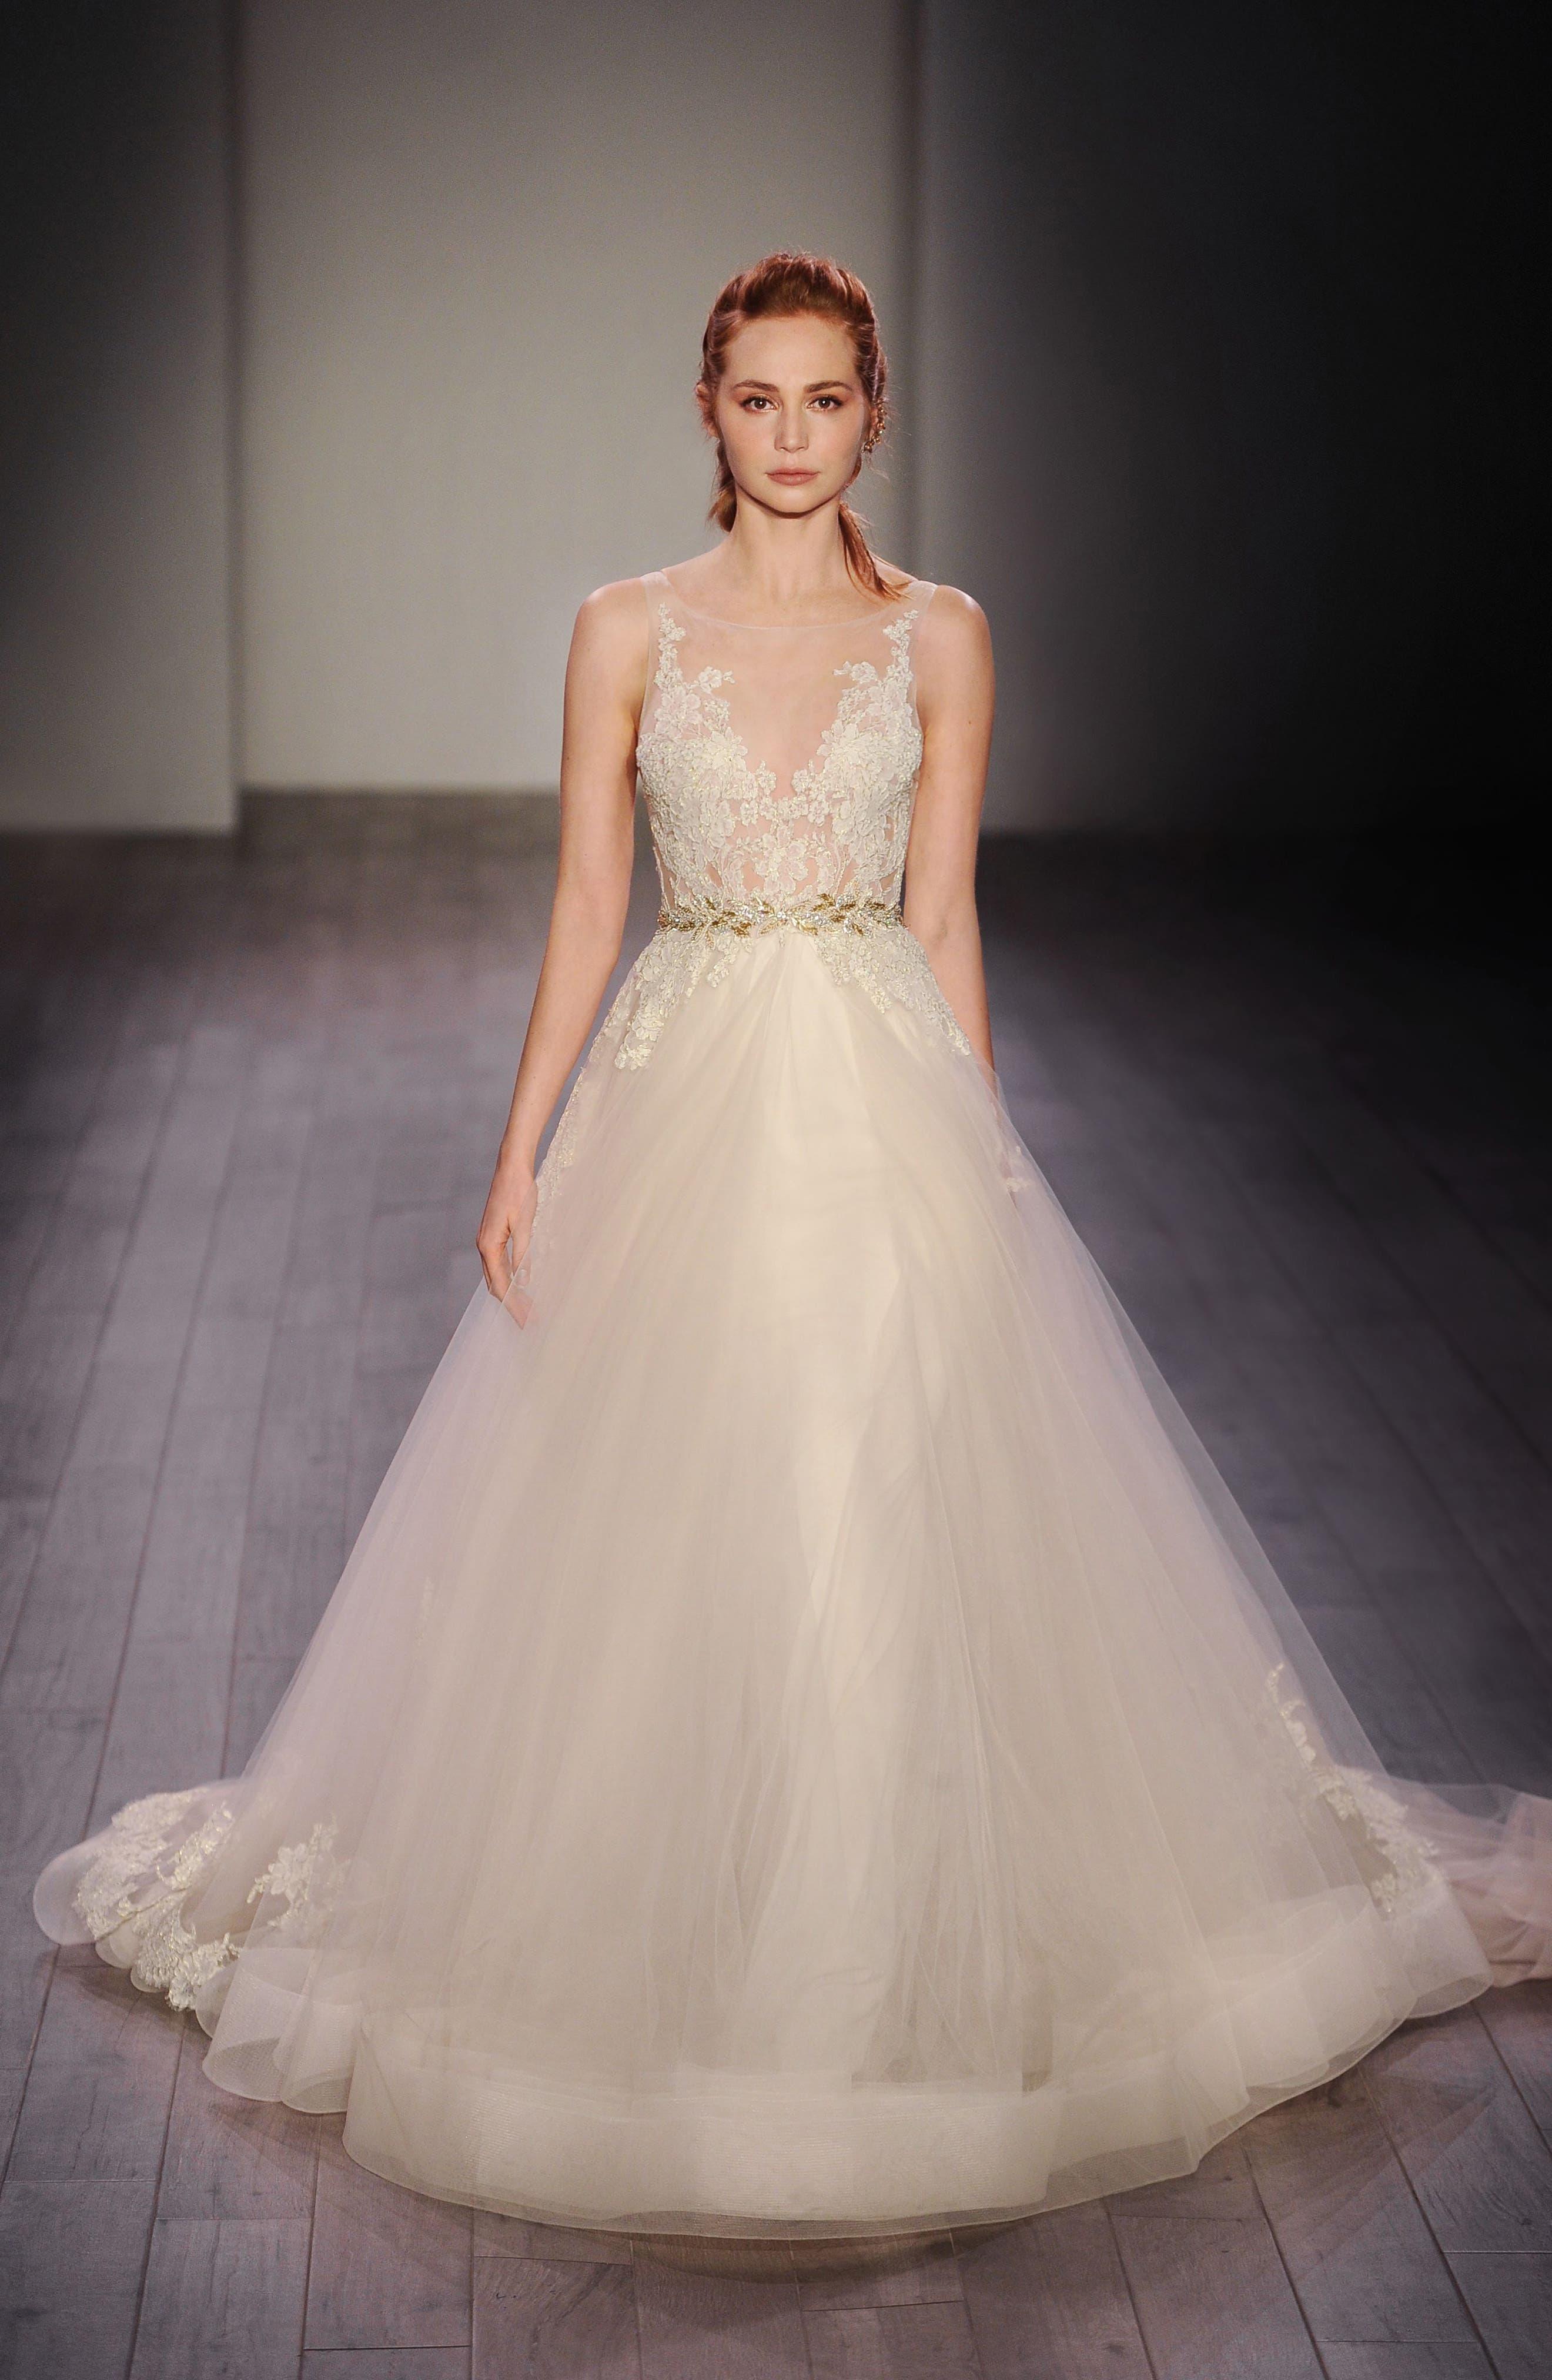 Lace Appliqué Tulle Ballgown Dress,                             Alternate thumbnail 5, color,                             IVORY/GOLD/CHAMPAGNE